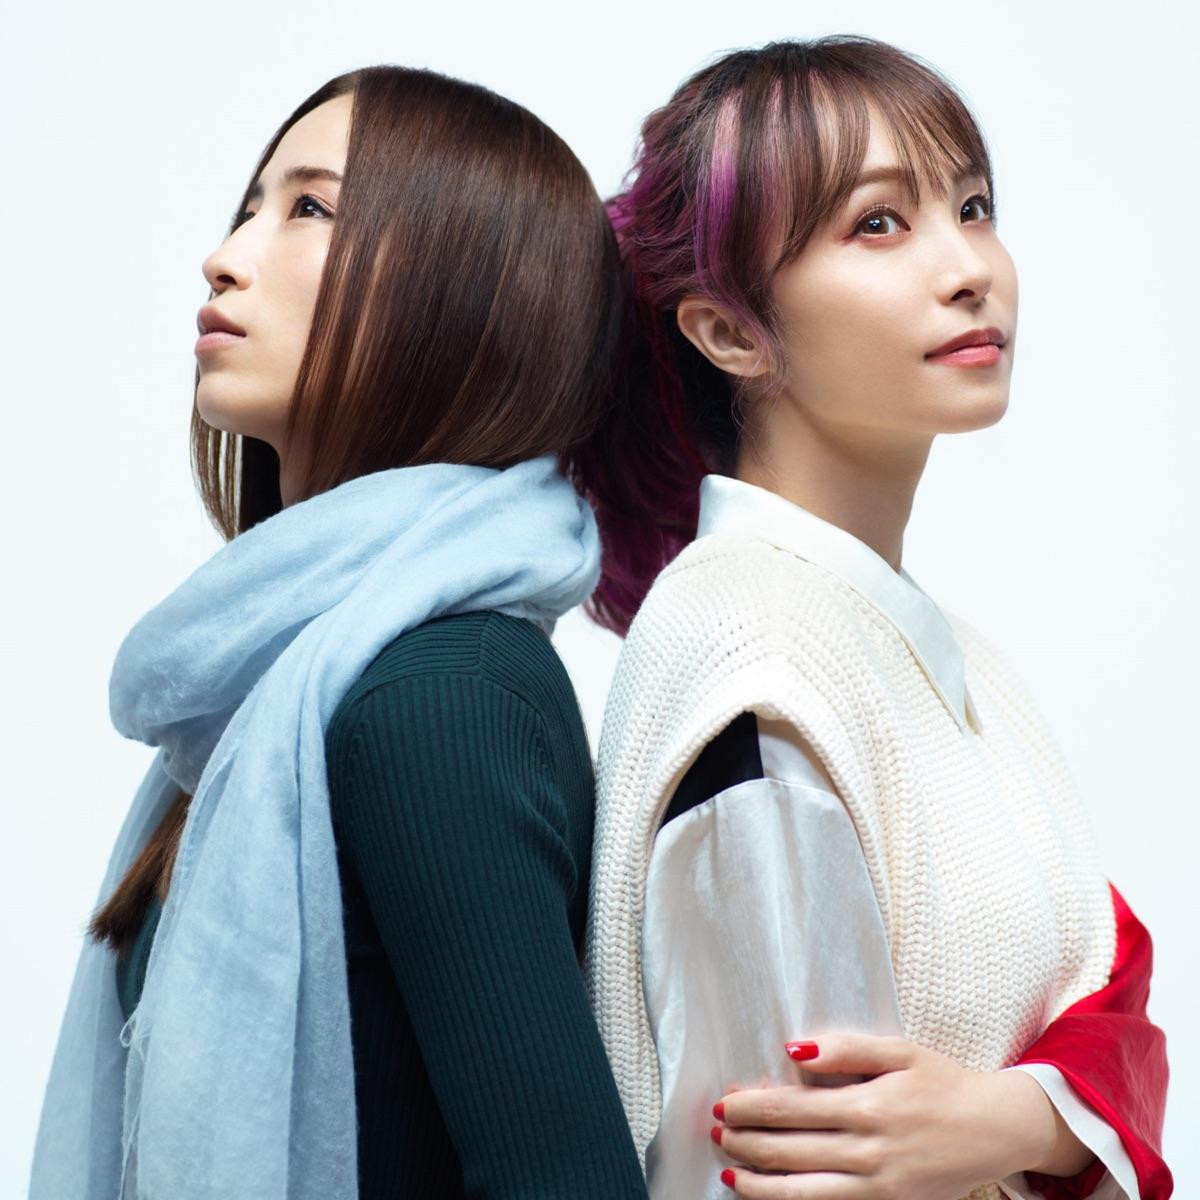 『LiSA×Uru - 再会 (produced by Ayase) 歌詞』収録の『再会 (produced by Ayase)』ジャケット